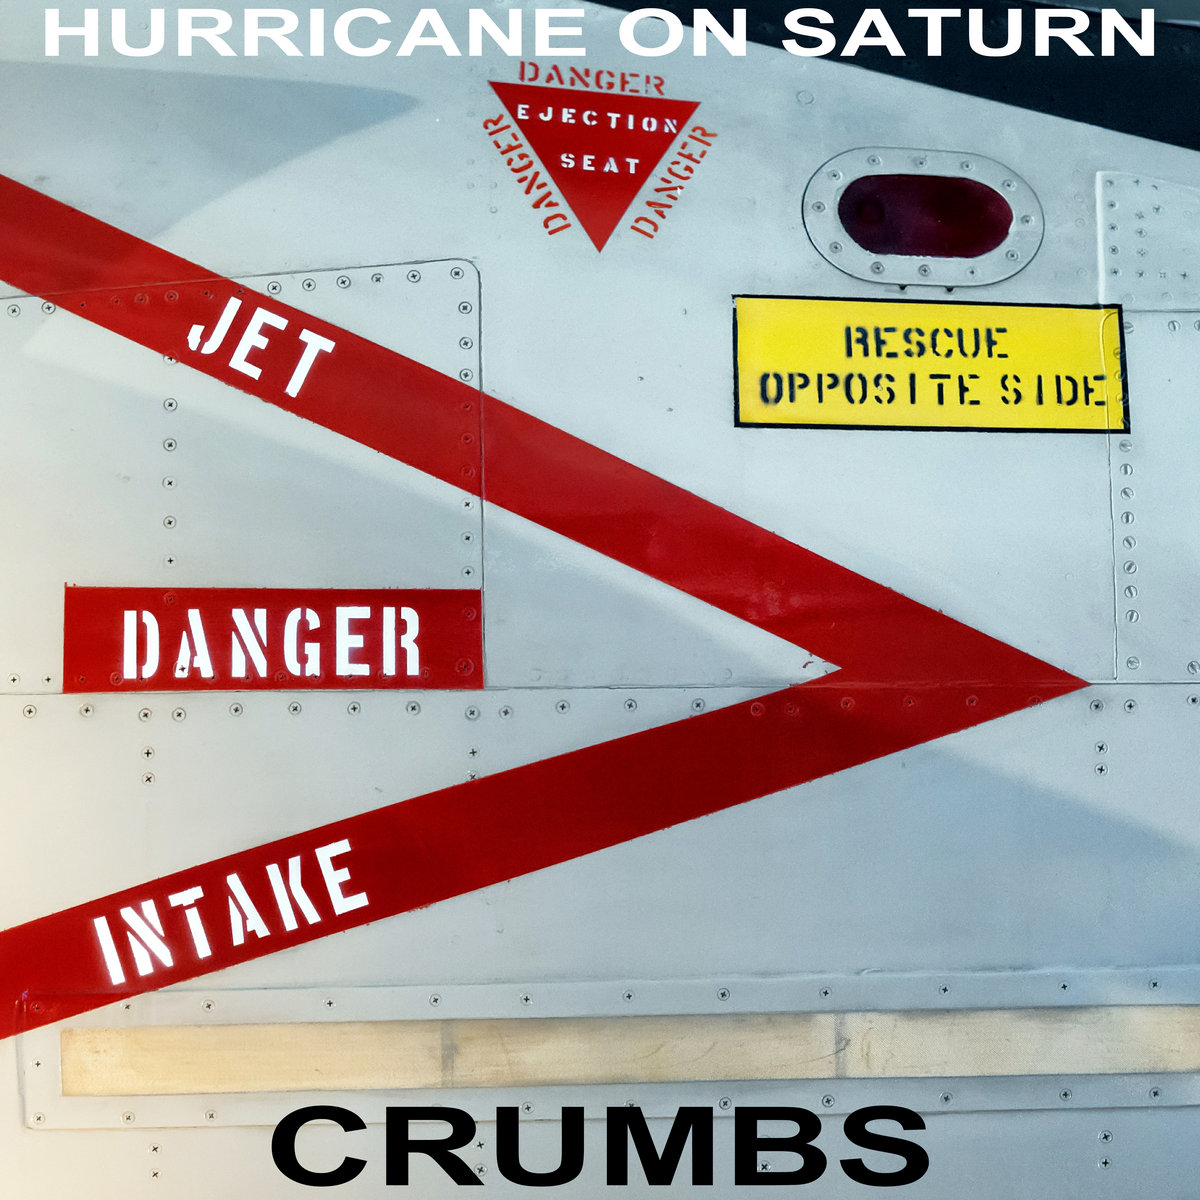 Crumbs by Hurricane On Saturn